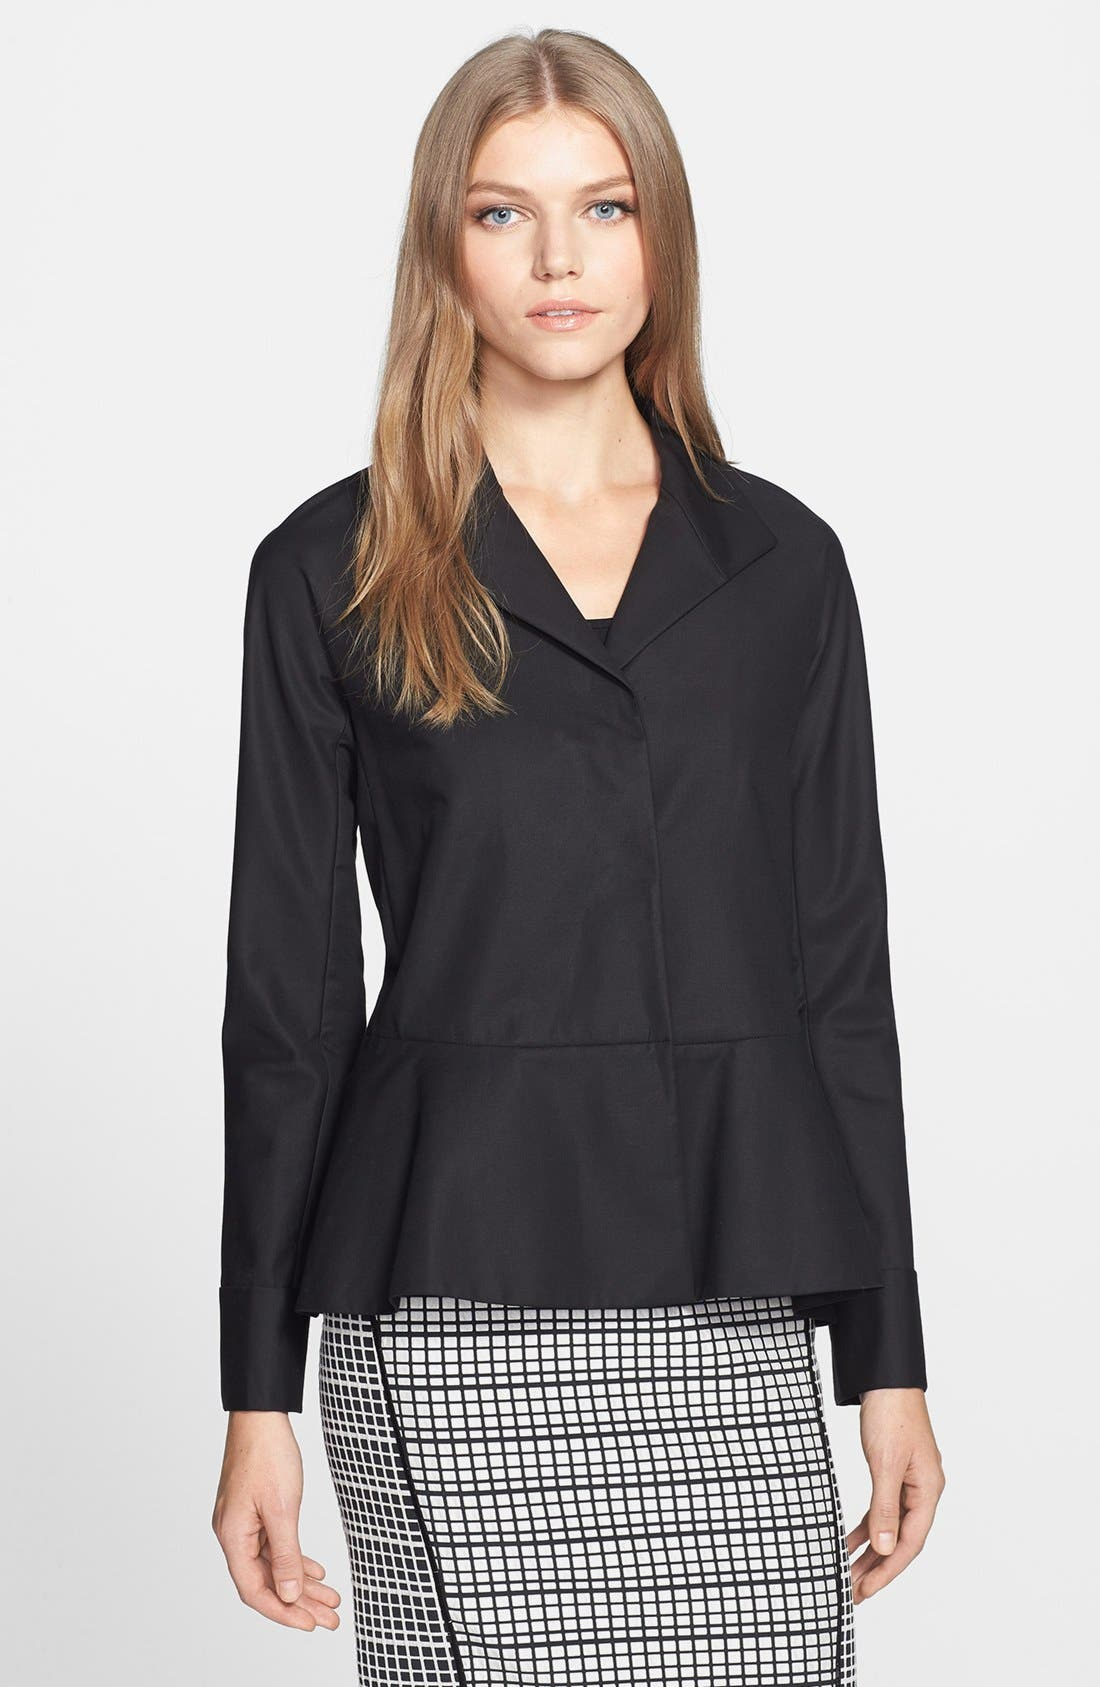 Alternate Image 1 Selected - Lafayette 148 New York 'Lara' Stretch Cotton Peplum Jacket